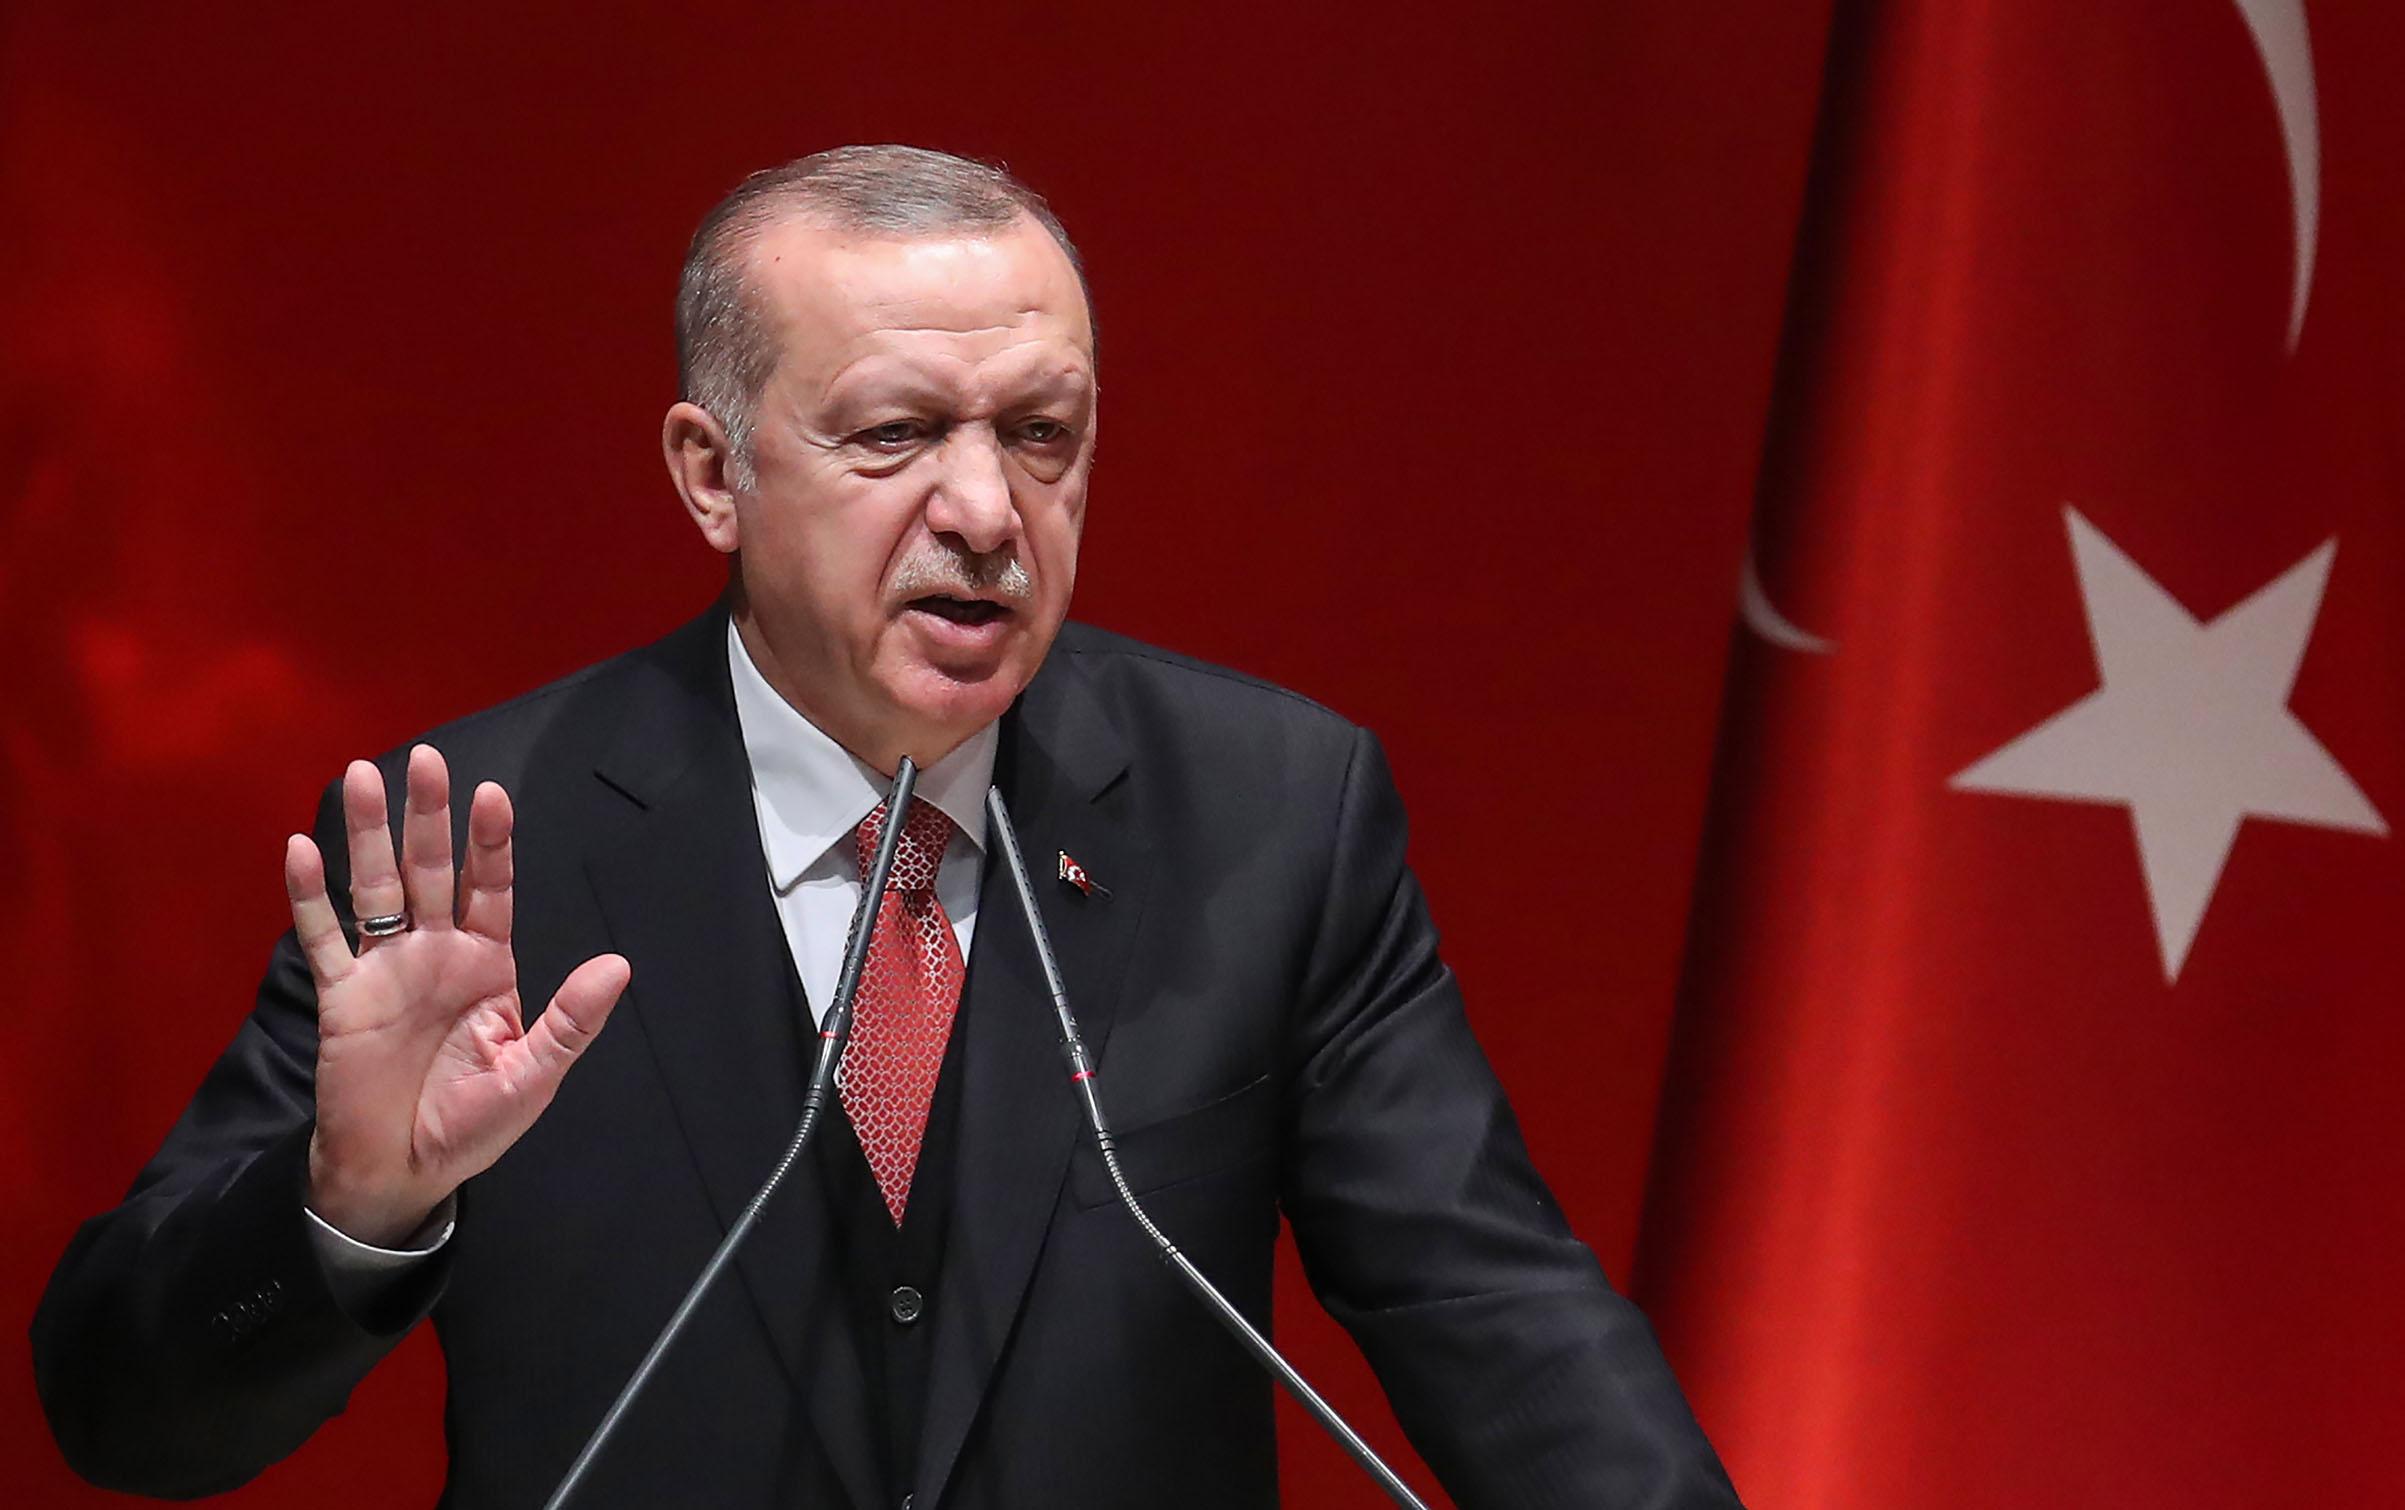 tayyip-erdogan-turkish-presidential-elections-view-bremmer.jpg